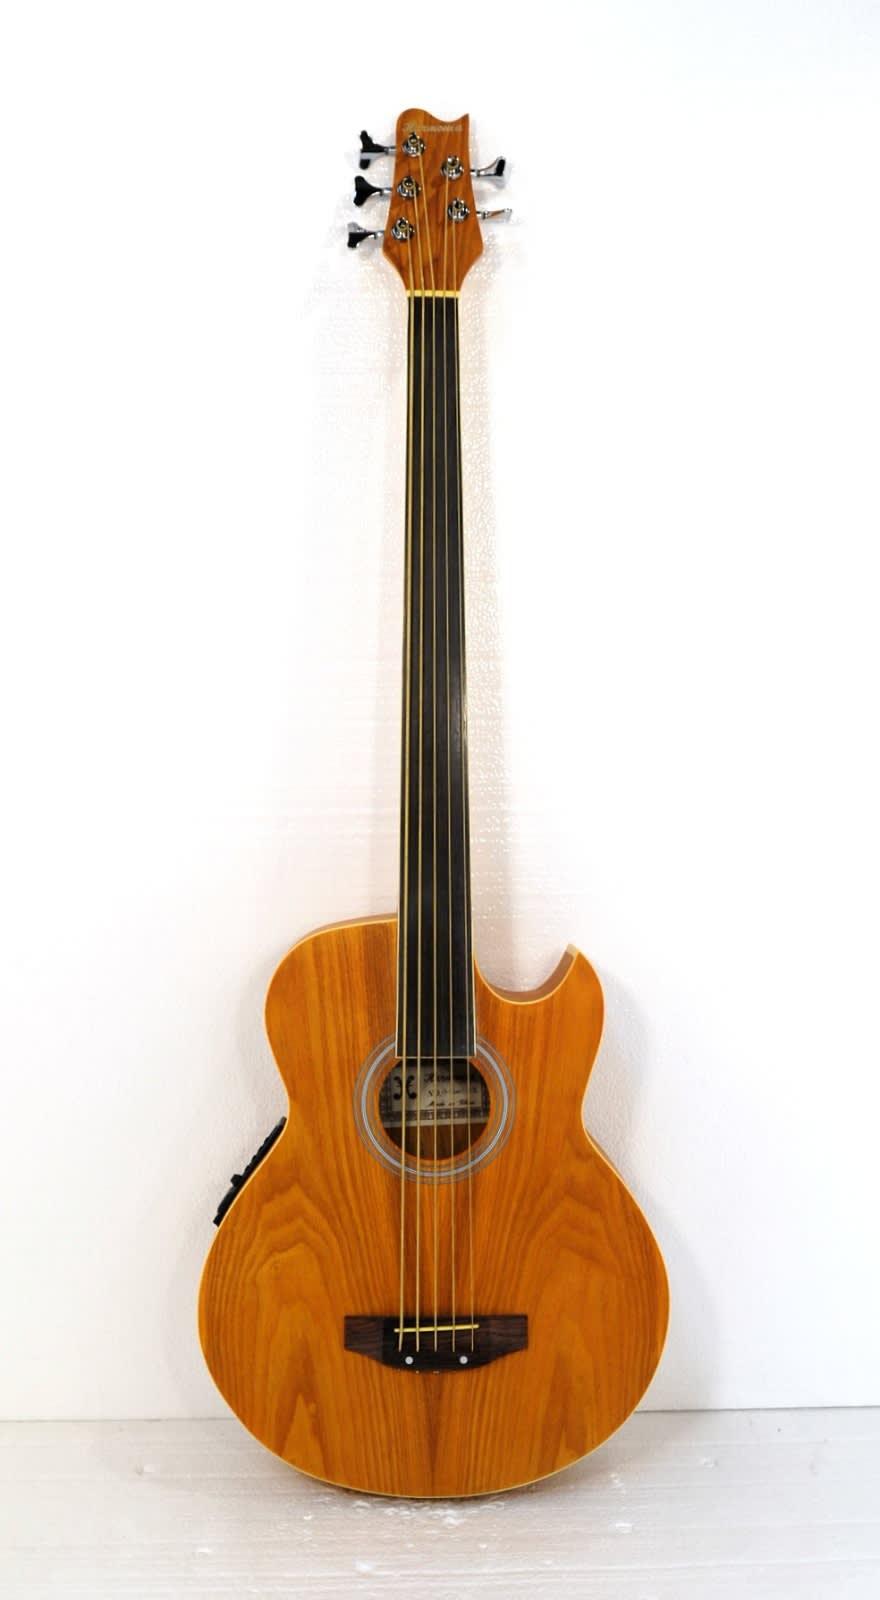 fretless 5 string acoustic electric bass mangolulu15 reverb. Black Bedroom Furniture Sets. Home Design Ideas